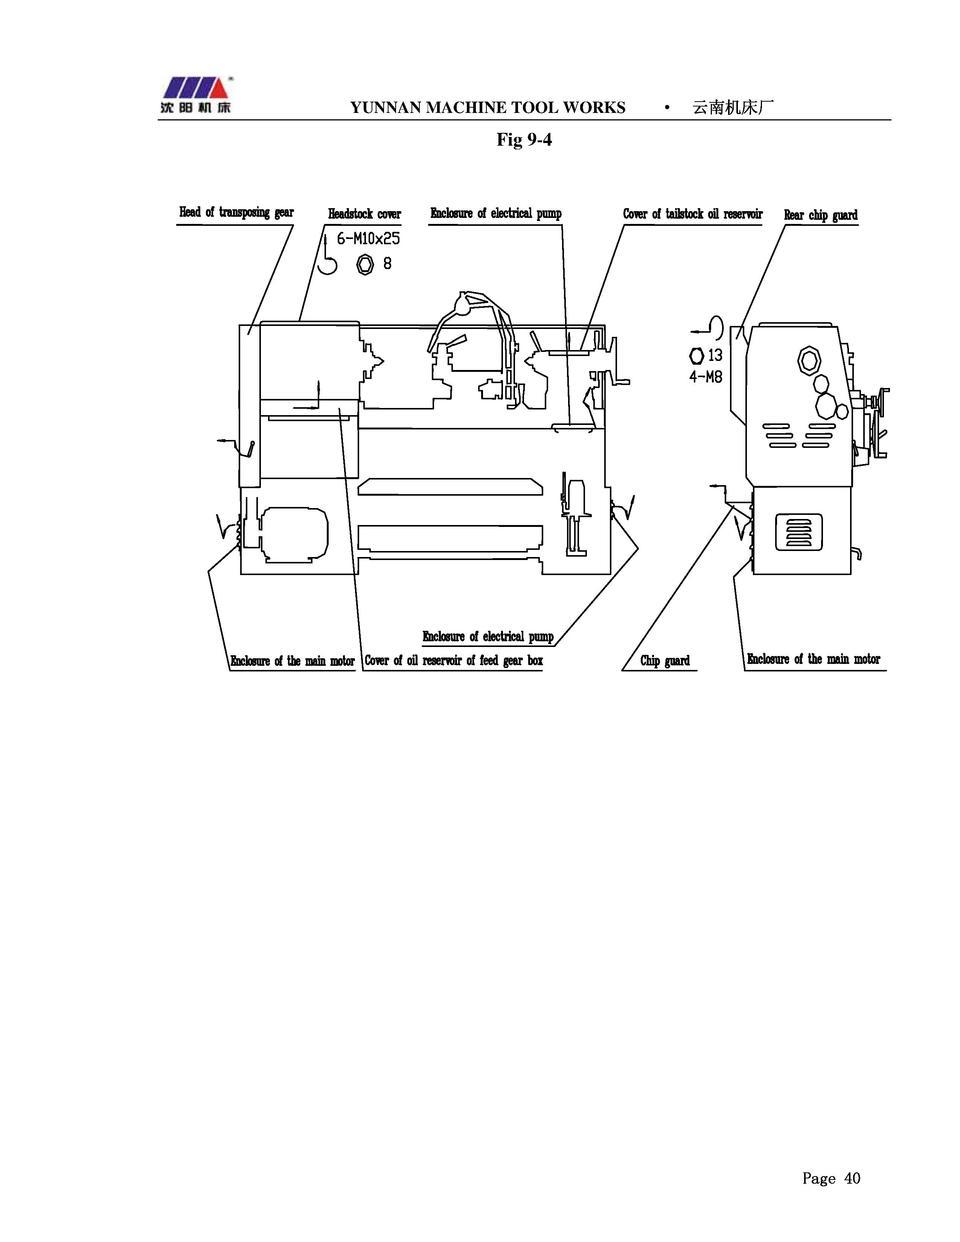 medium resolution of yunnan machine tool works